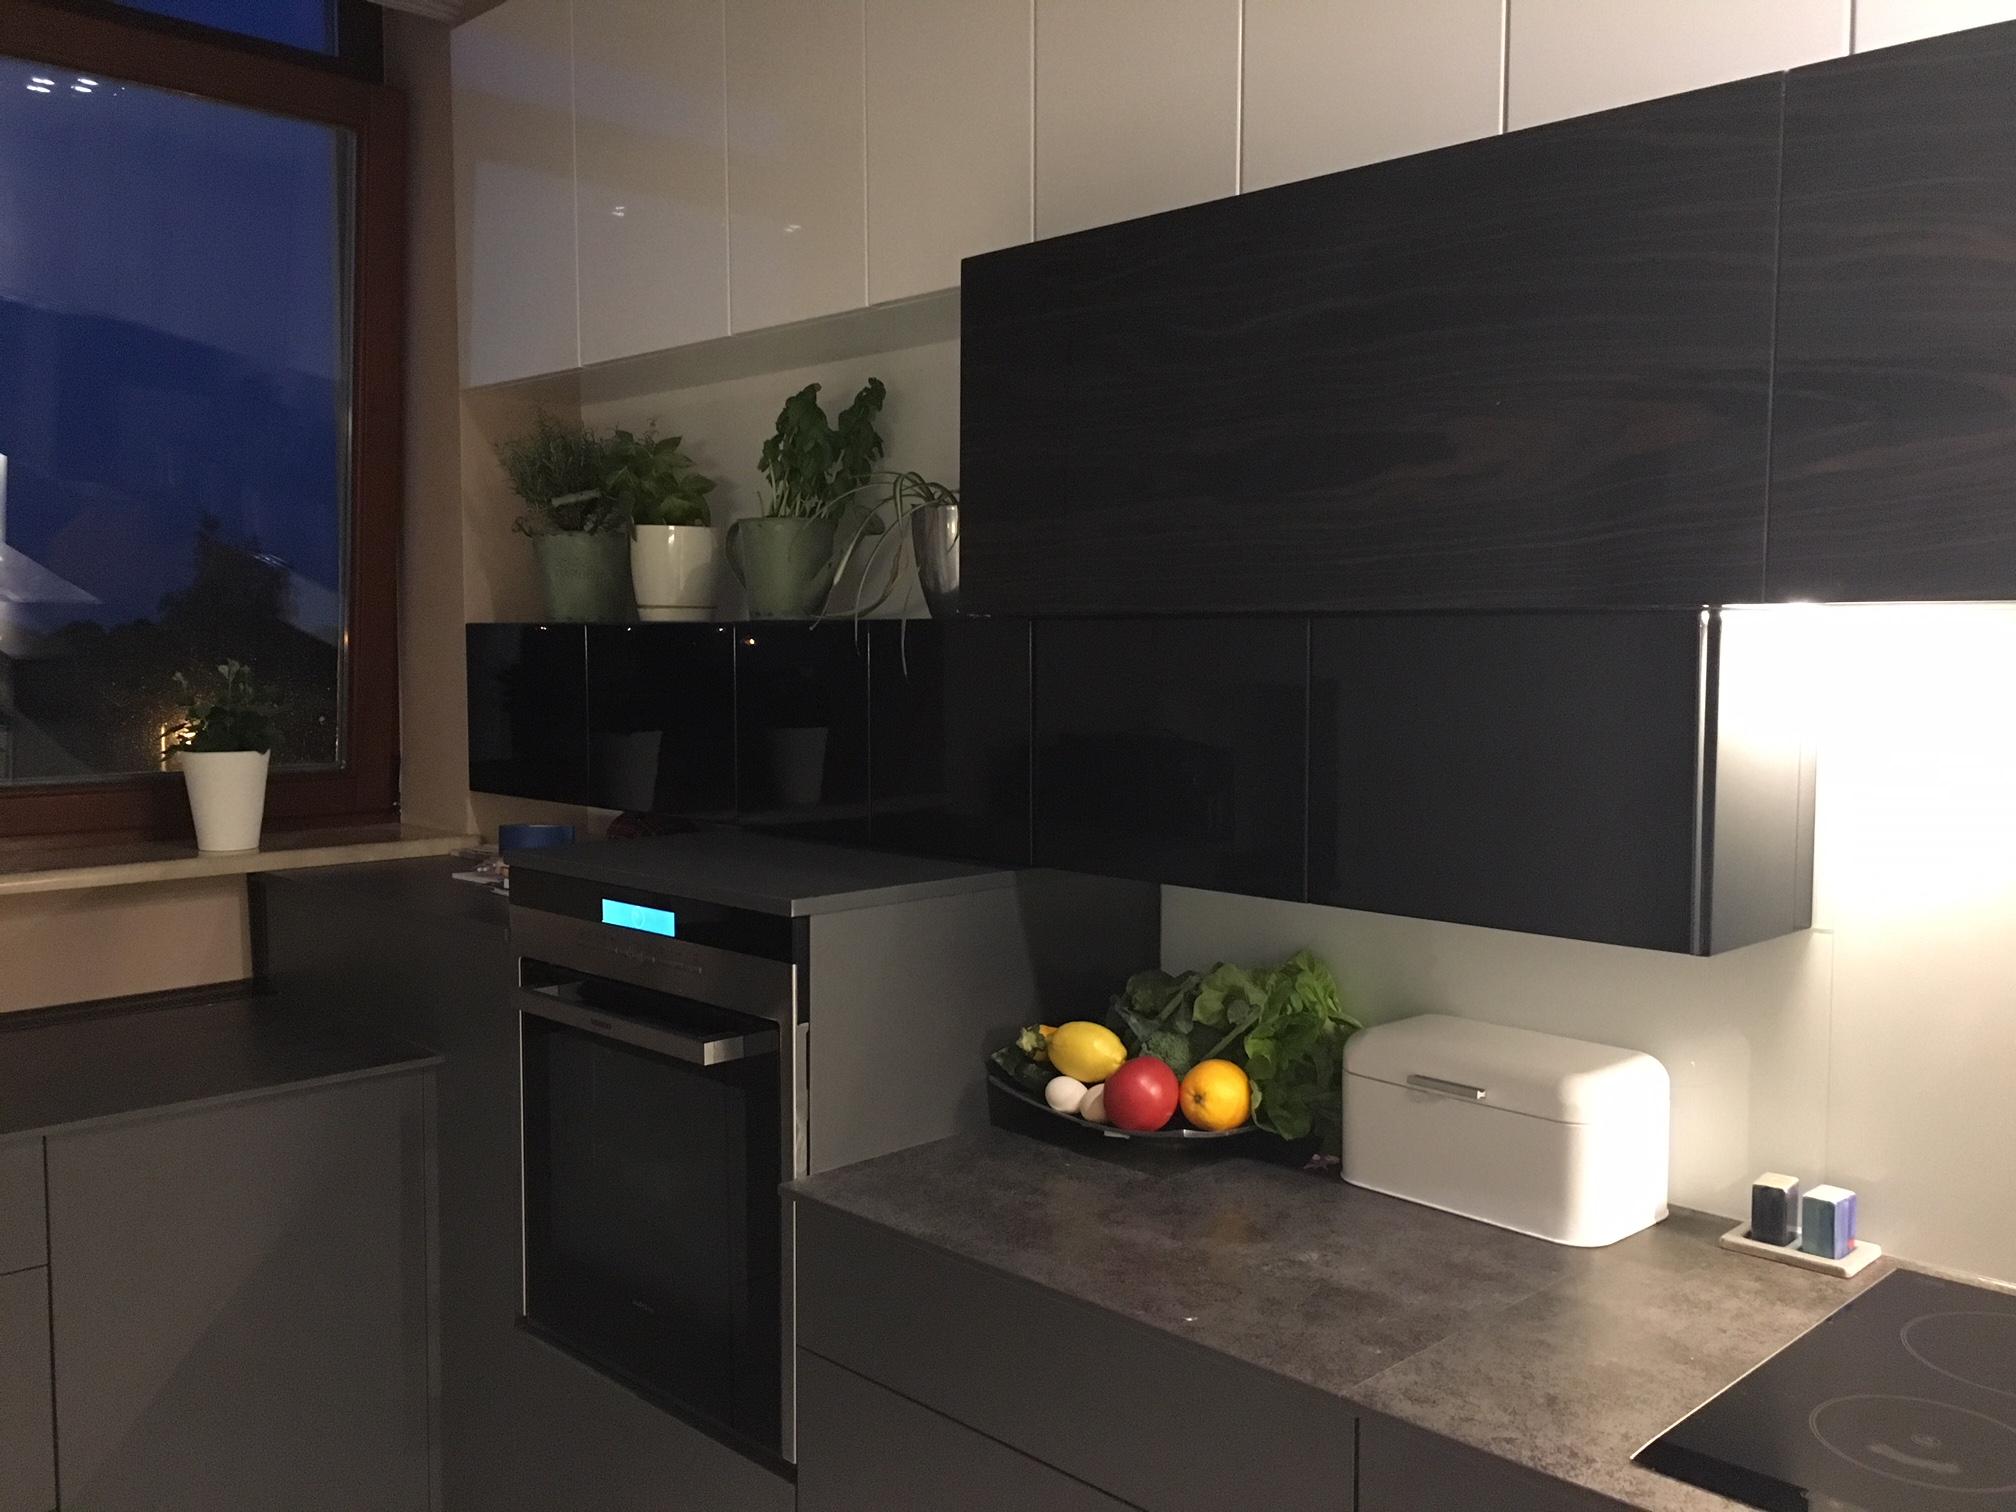 projekt kuchni- oświetlenie